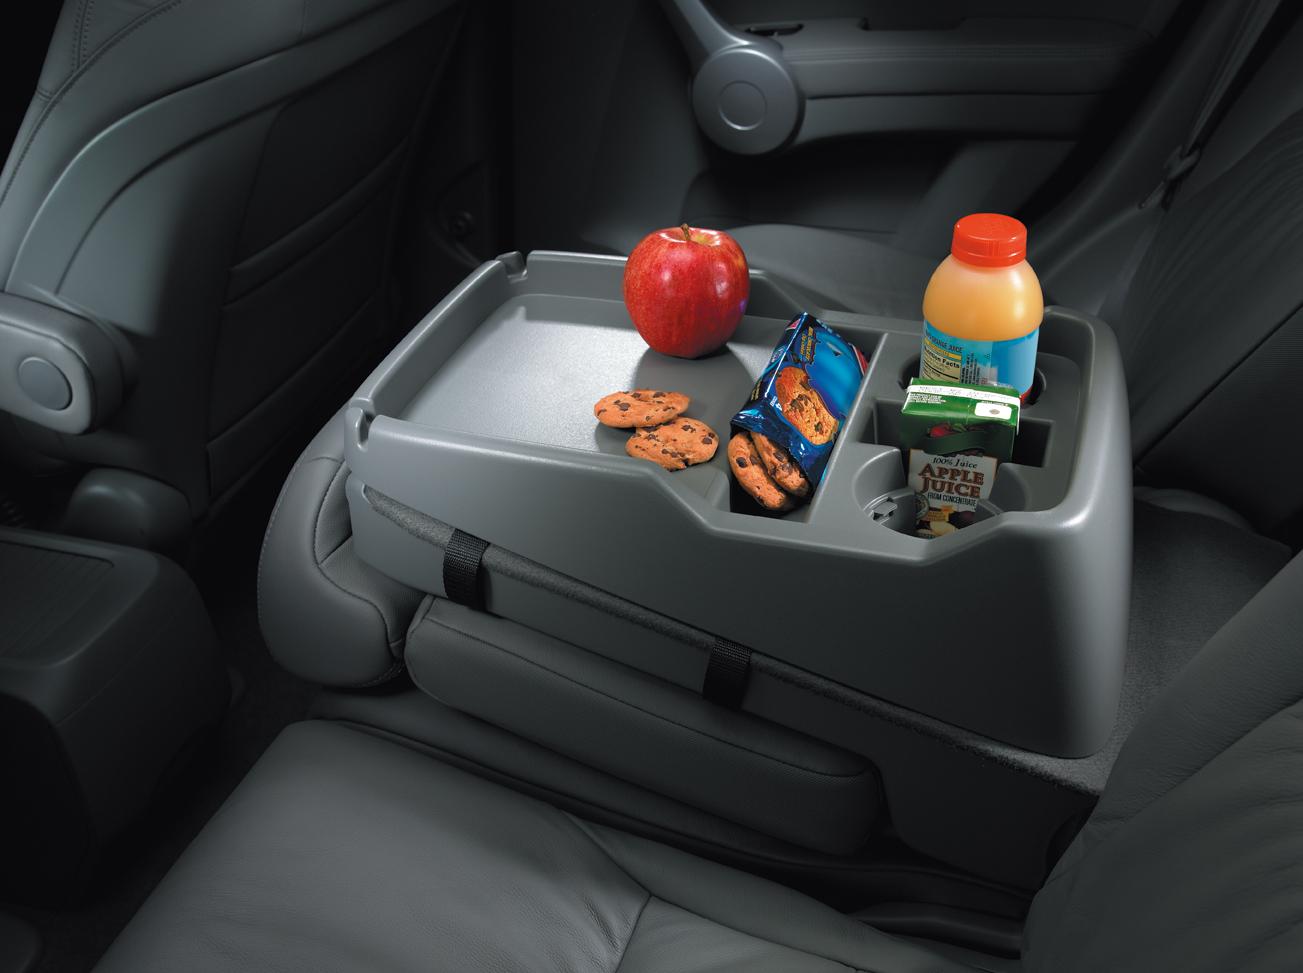 2009 honda crv rear cargo tray view 2017 2018 best. Black Bedroom Furniture Sets. Home Design Ideas